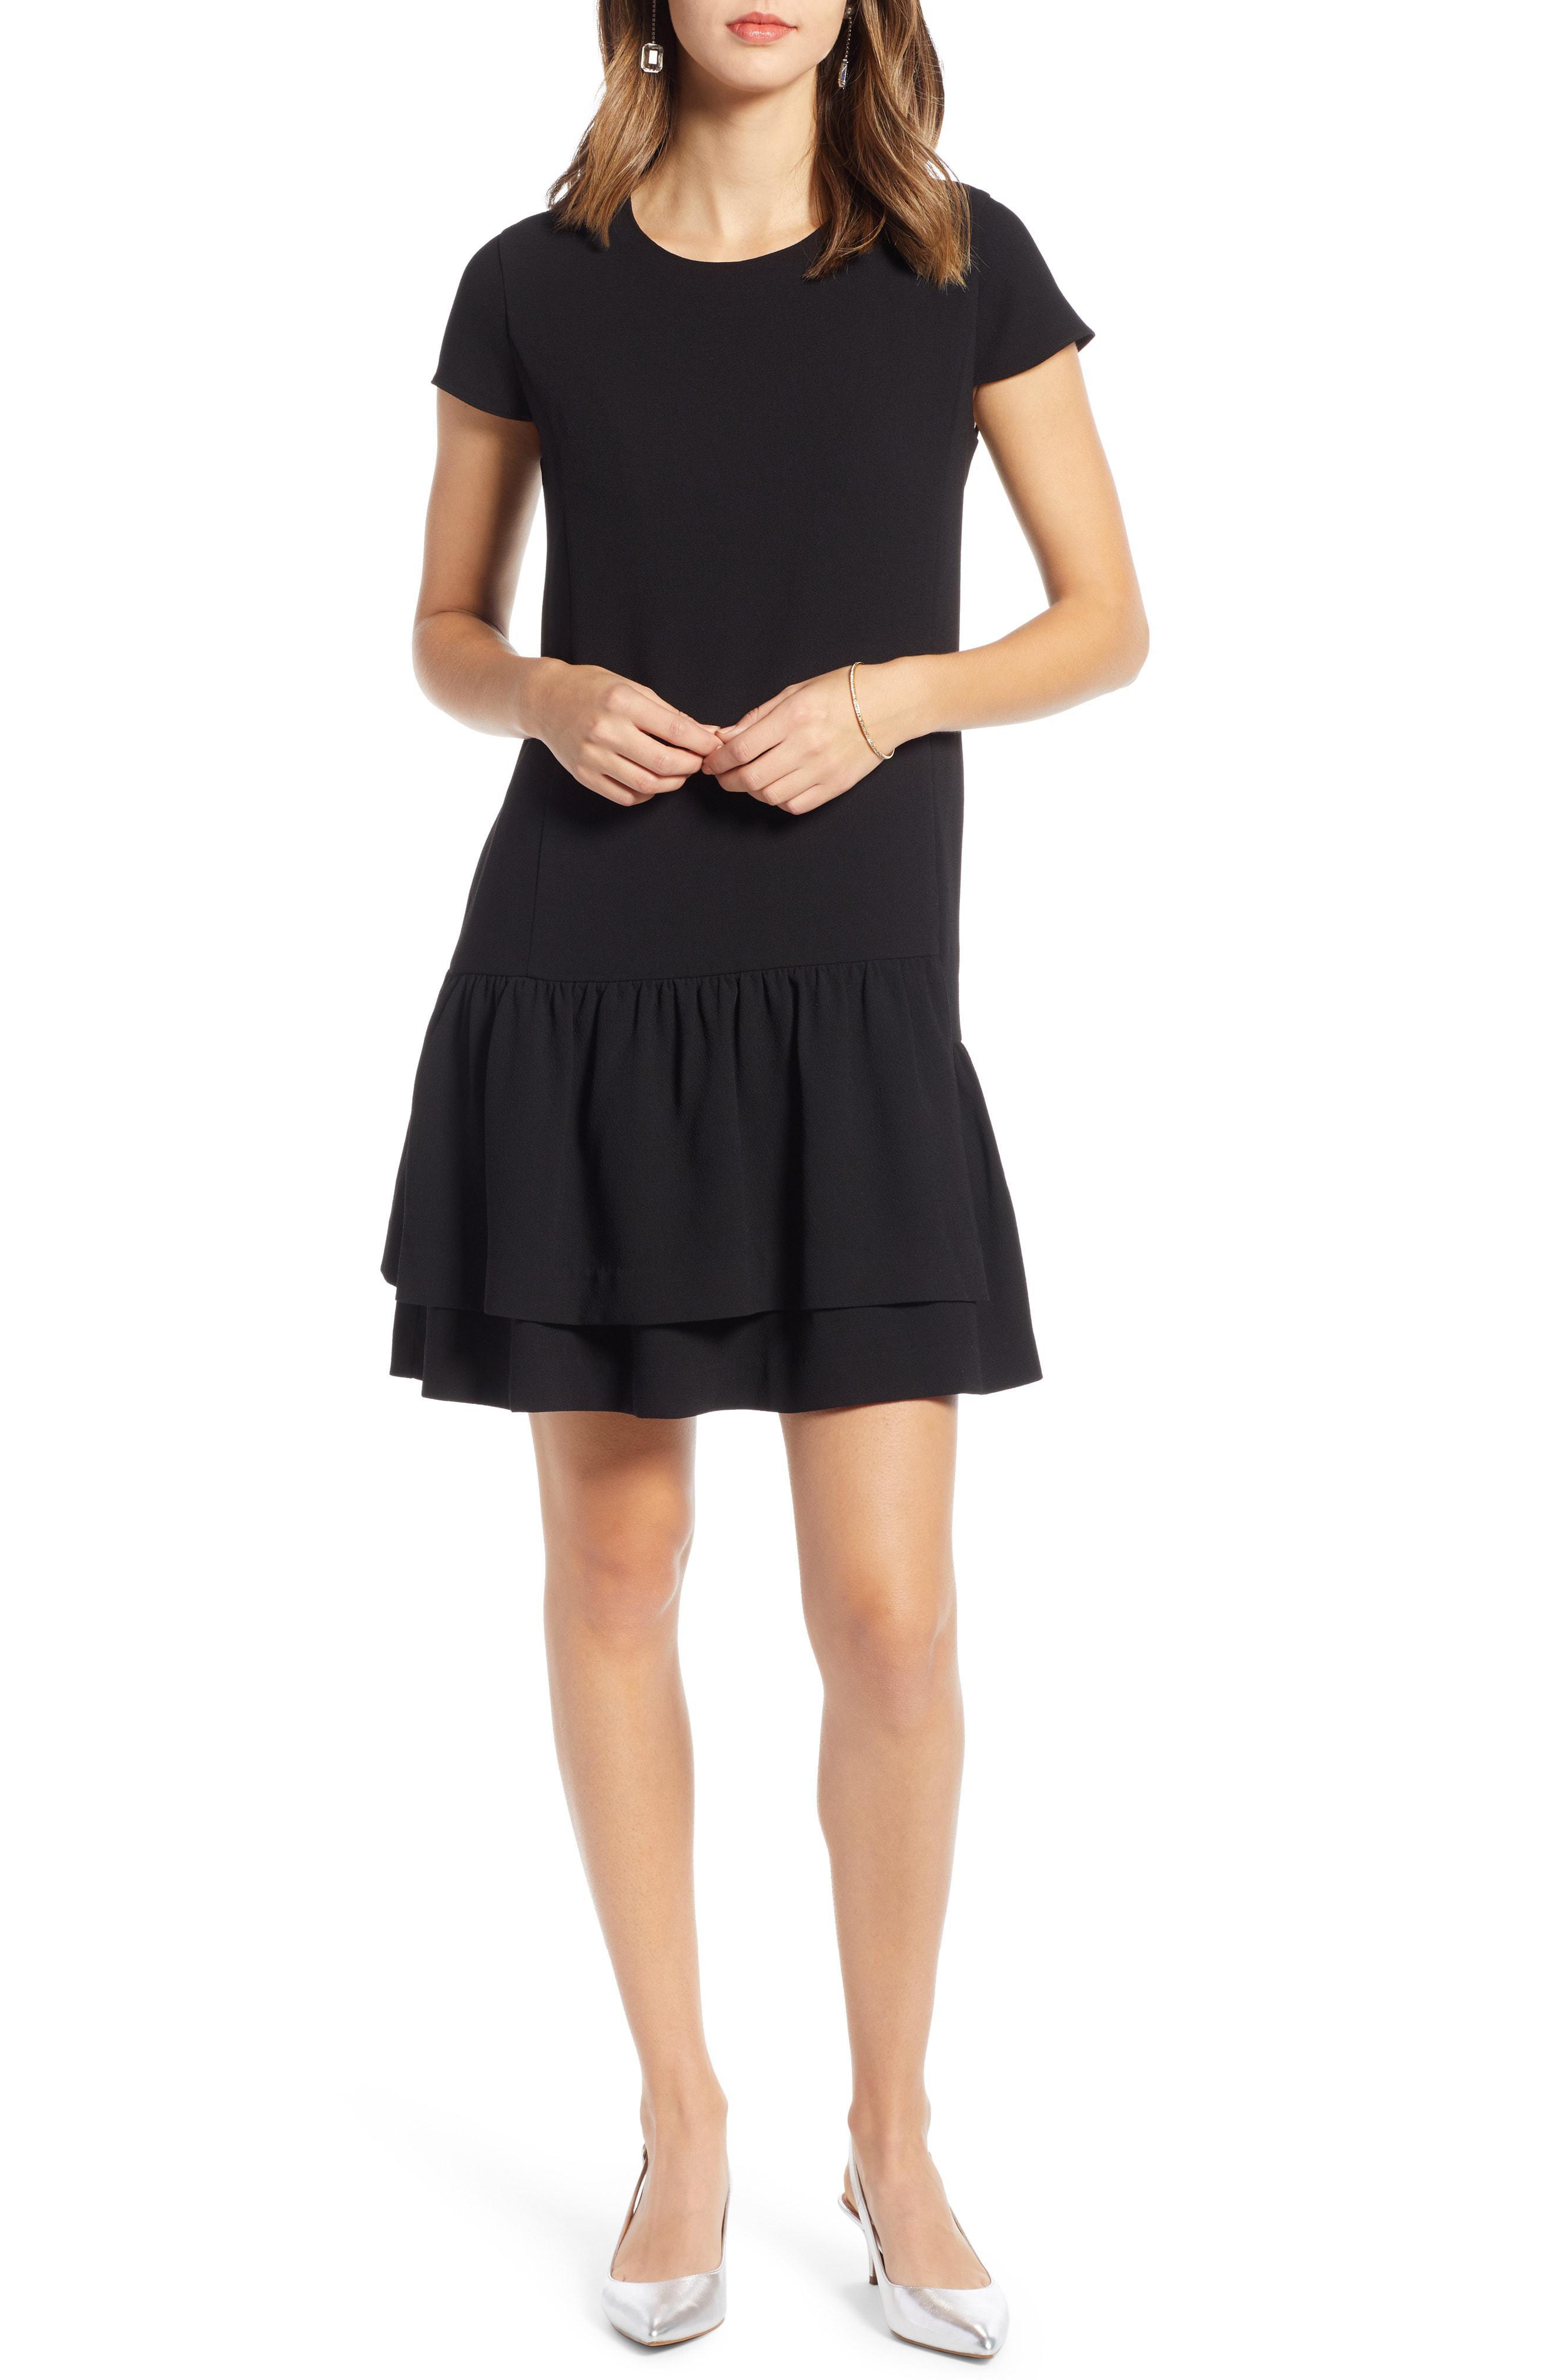 962e59d4fbc Lyst - Nordstrom 1901 Ruffle Hem Dress in Black